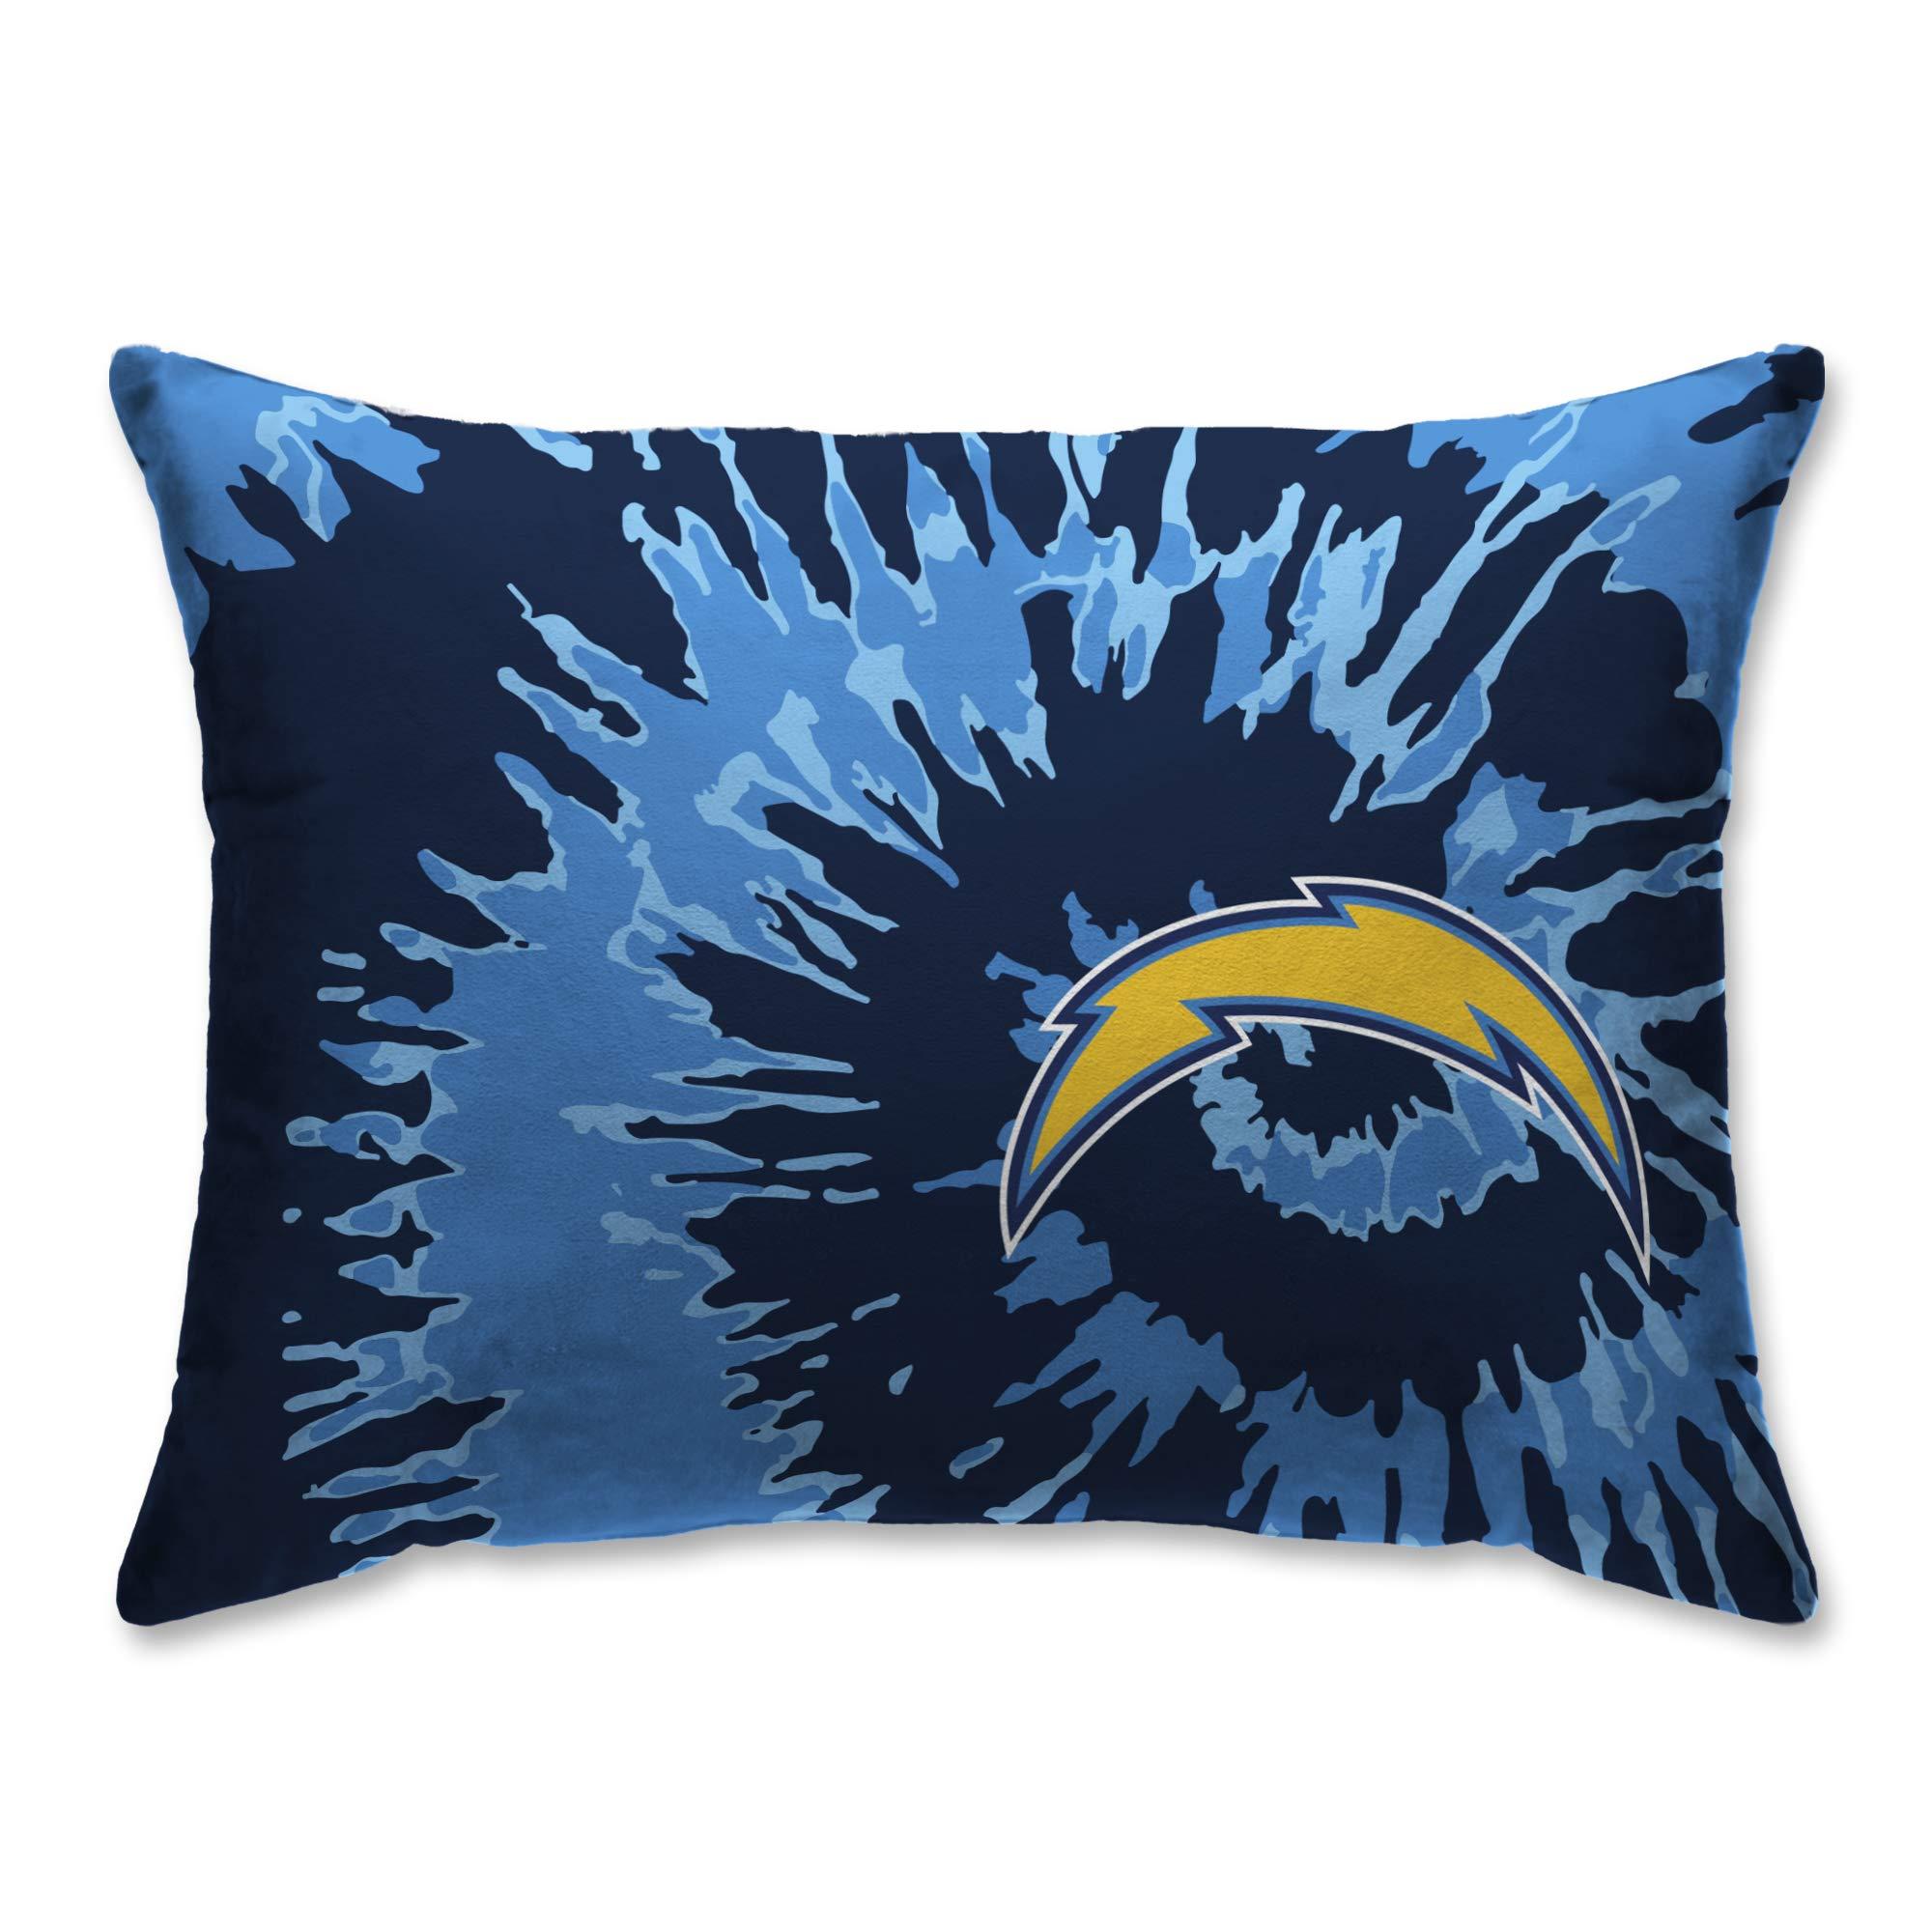 Pegasus Sports Los Angeles Chargers Tie Dye 20'' x 26'' Plush Bed Pillow, Set of 2#179596778 by Pegasus Sports